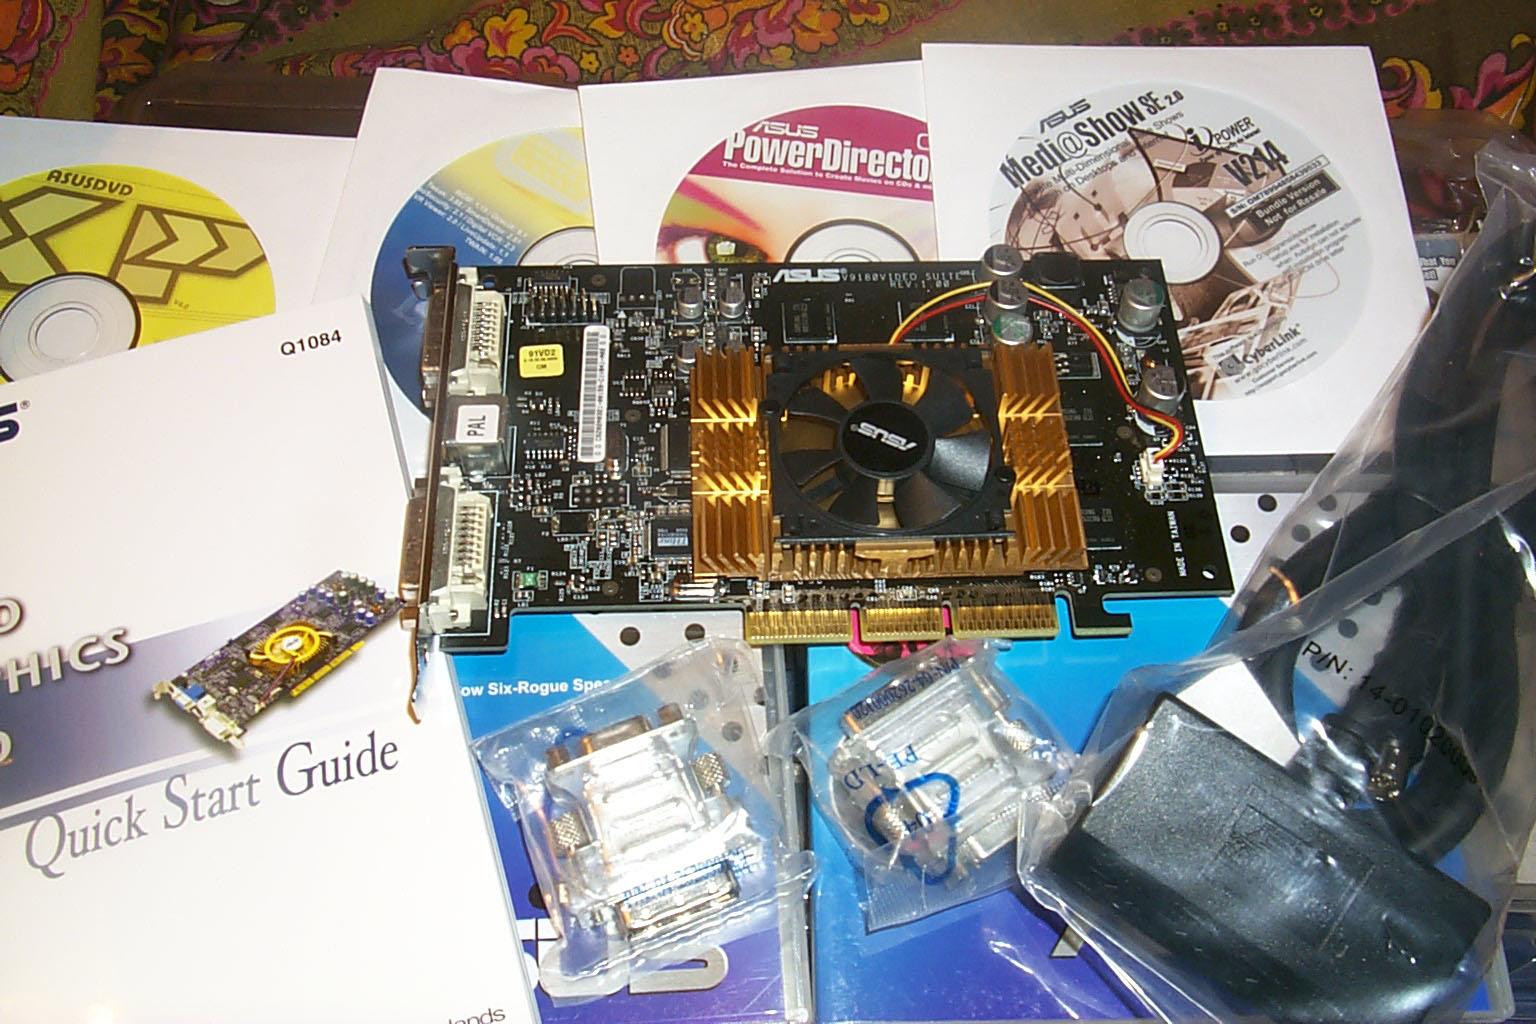 Geforce4 Mx 4000 Drivers